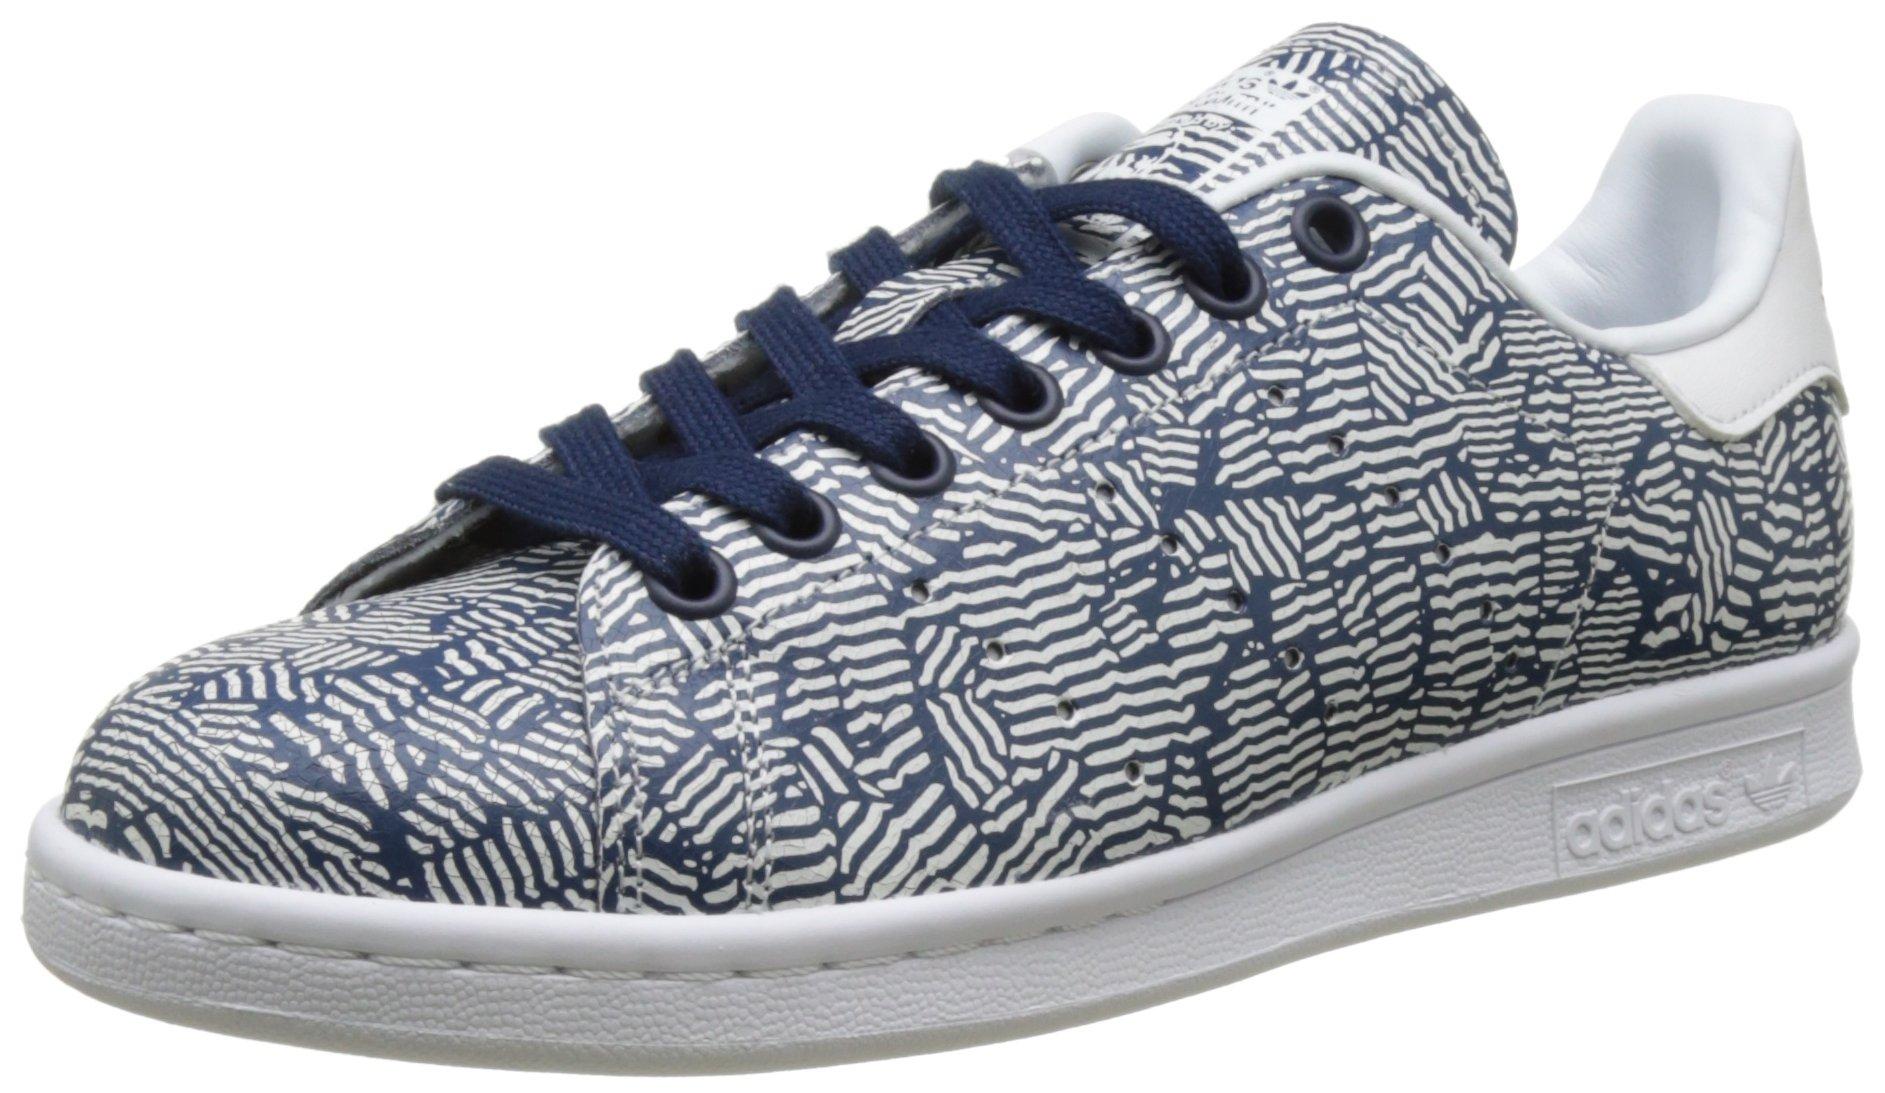 Stan SmithBaskets Collegiate Adidas FemmesBleu footwear Basses Navy White36 Eu m08nwvNO